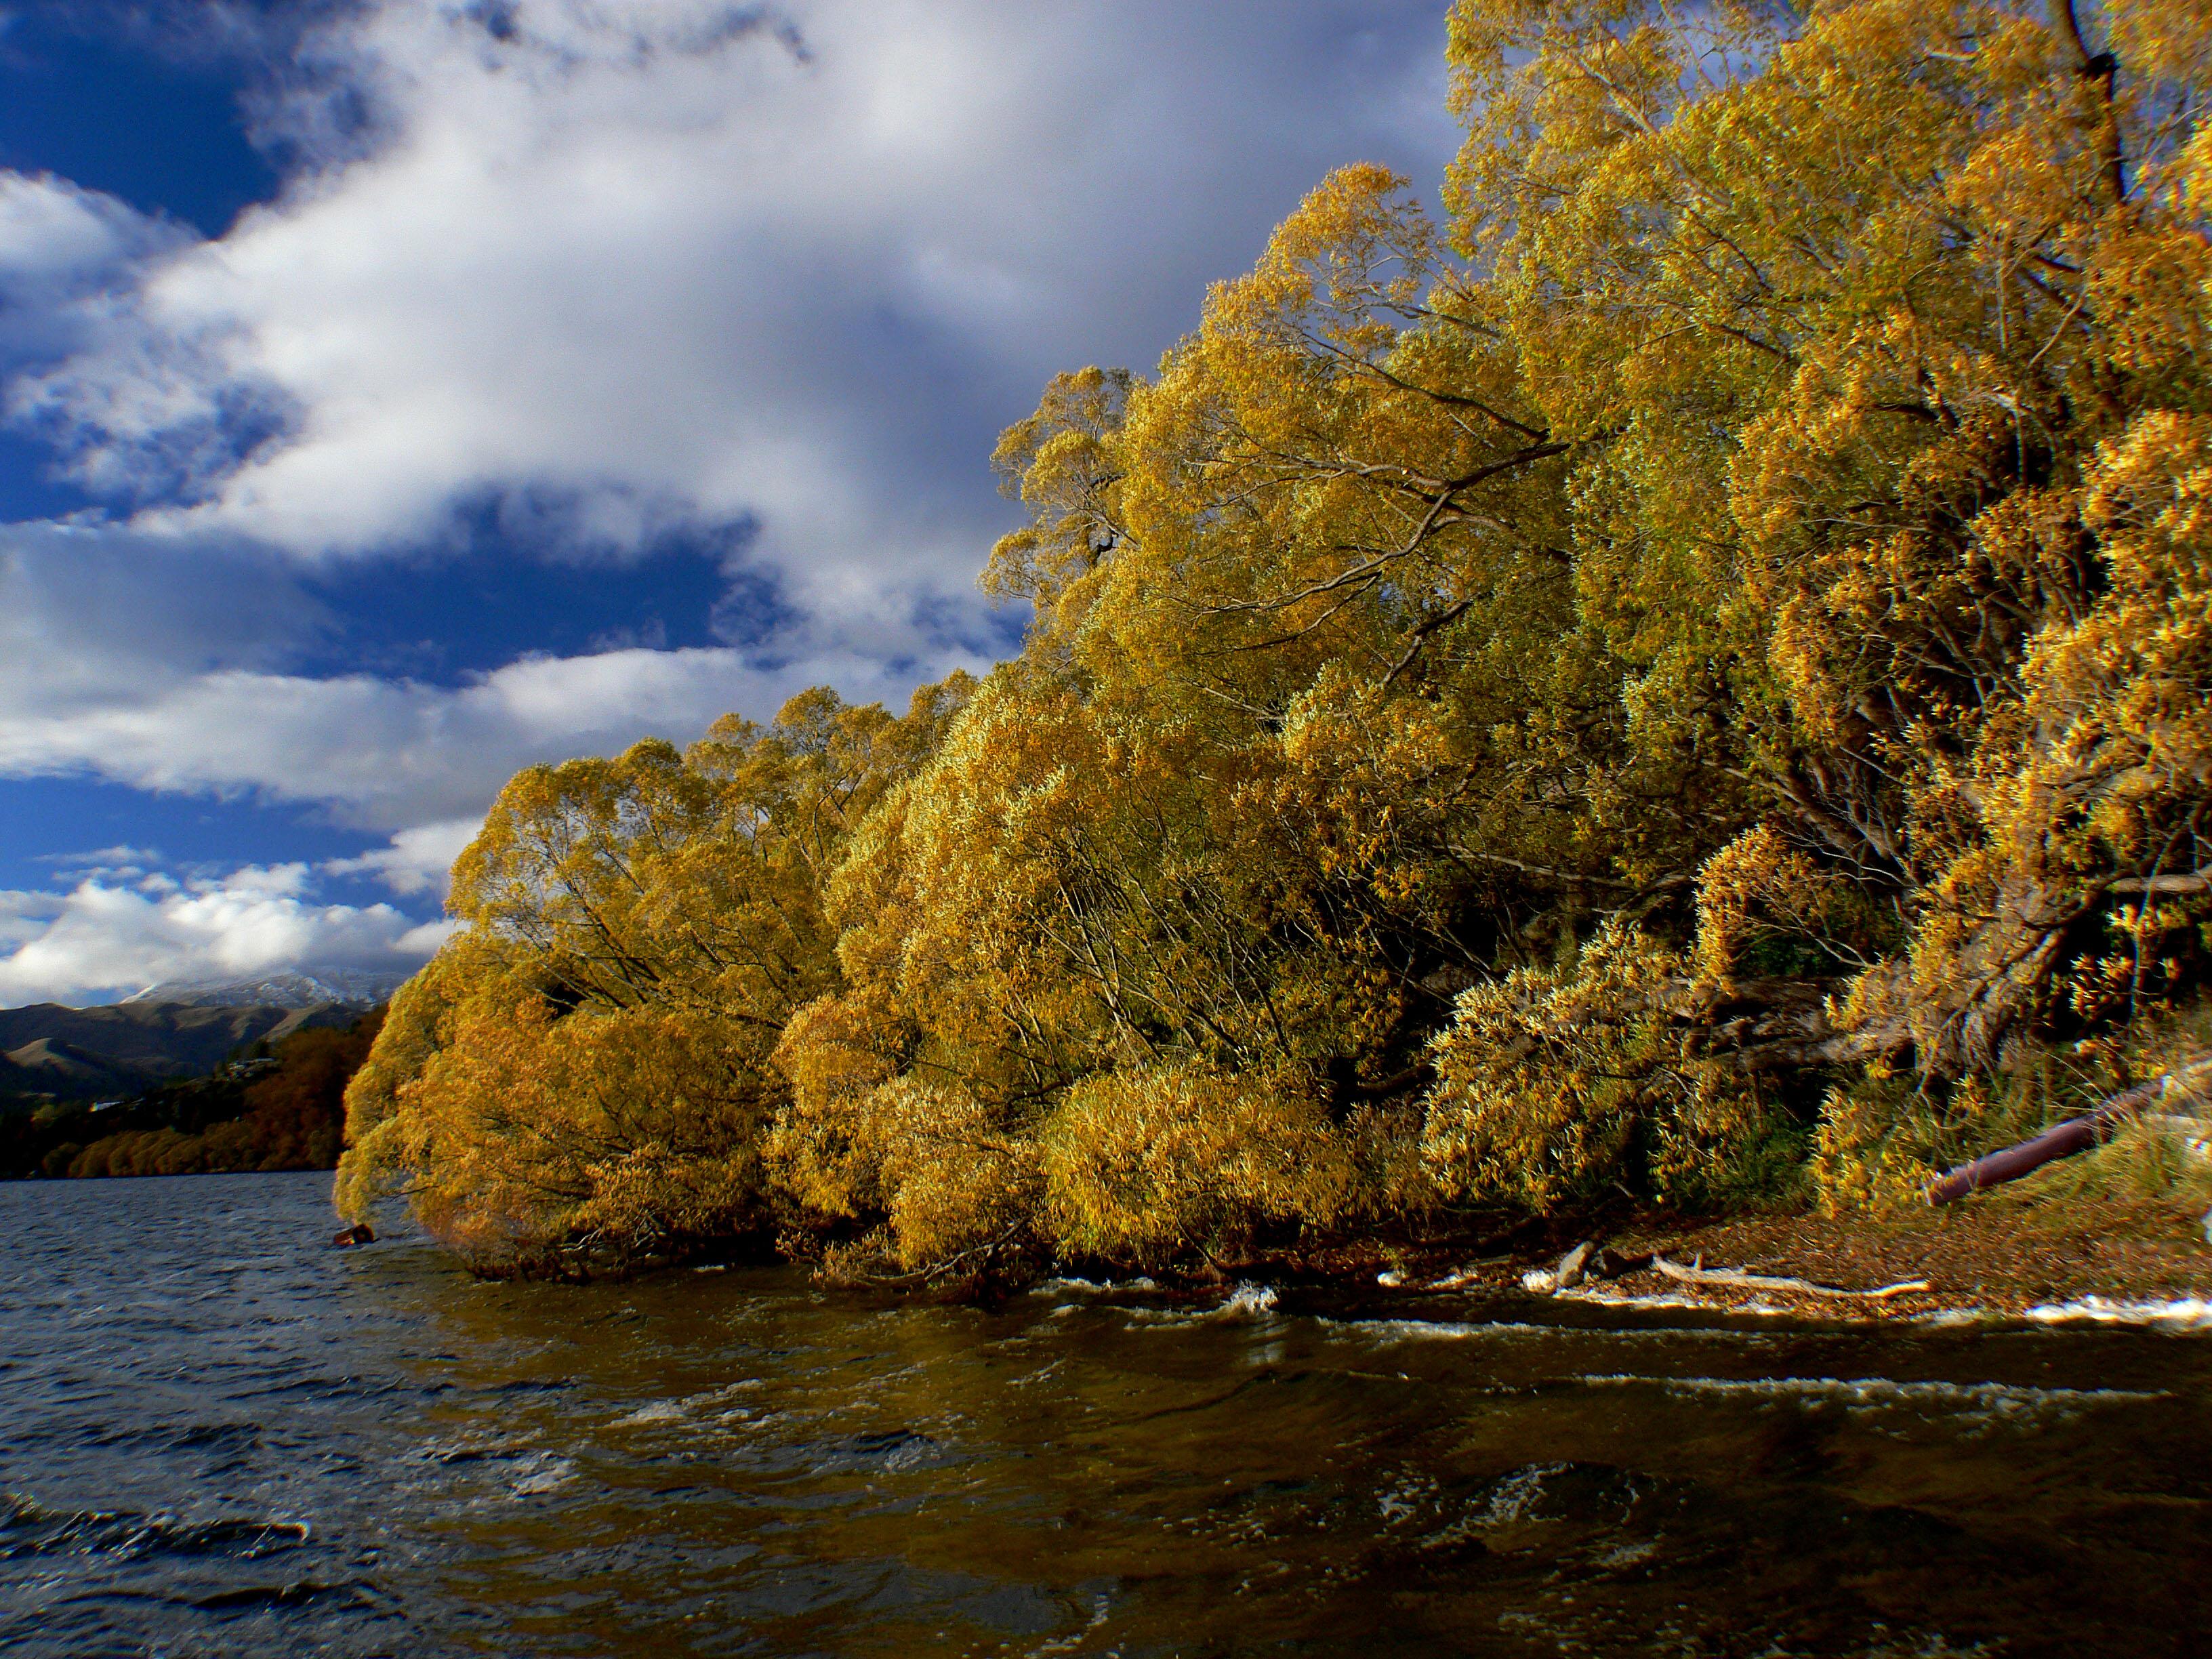 Lake hayes otago nz (6) photo